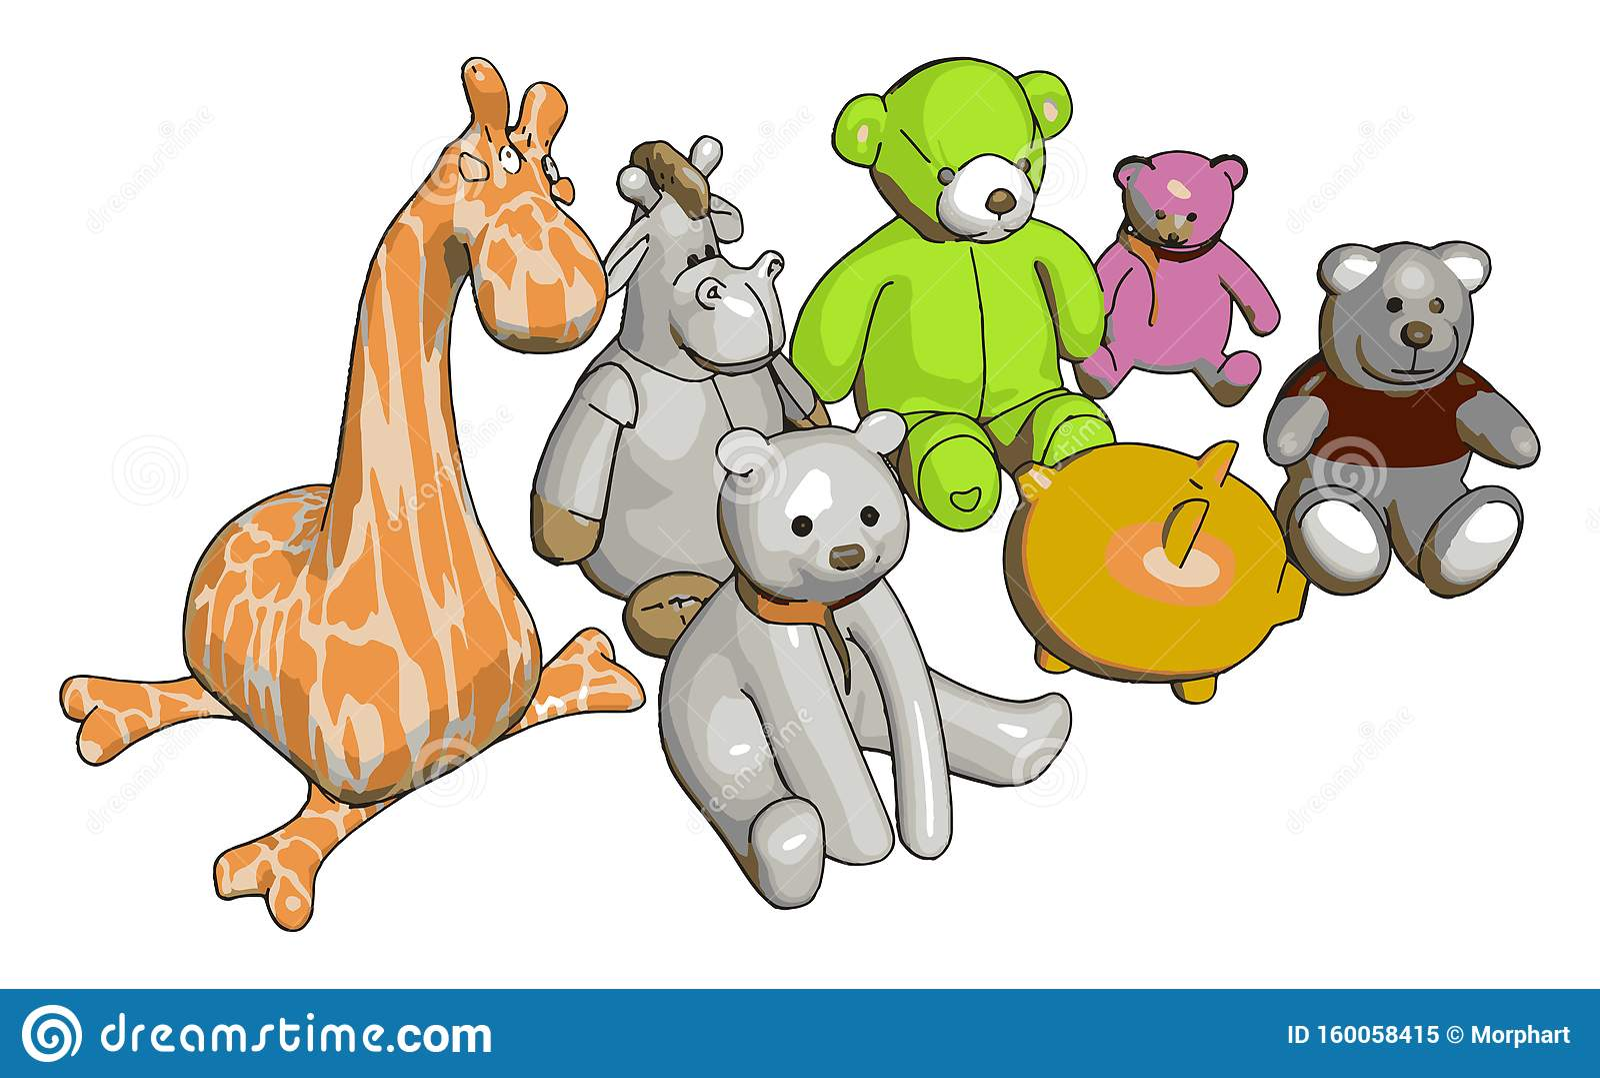 Various Stuffed Toy Animals Vector Illustration Stock Vector Illustration Of Kids Instrument 160058415